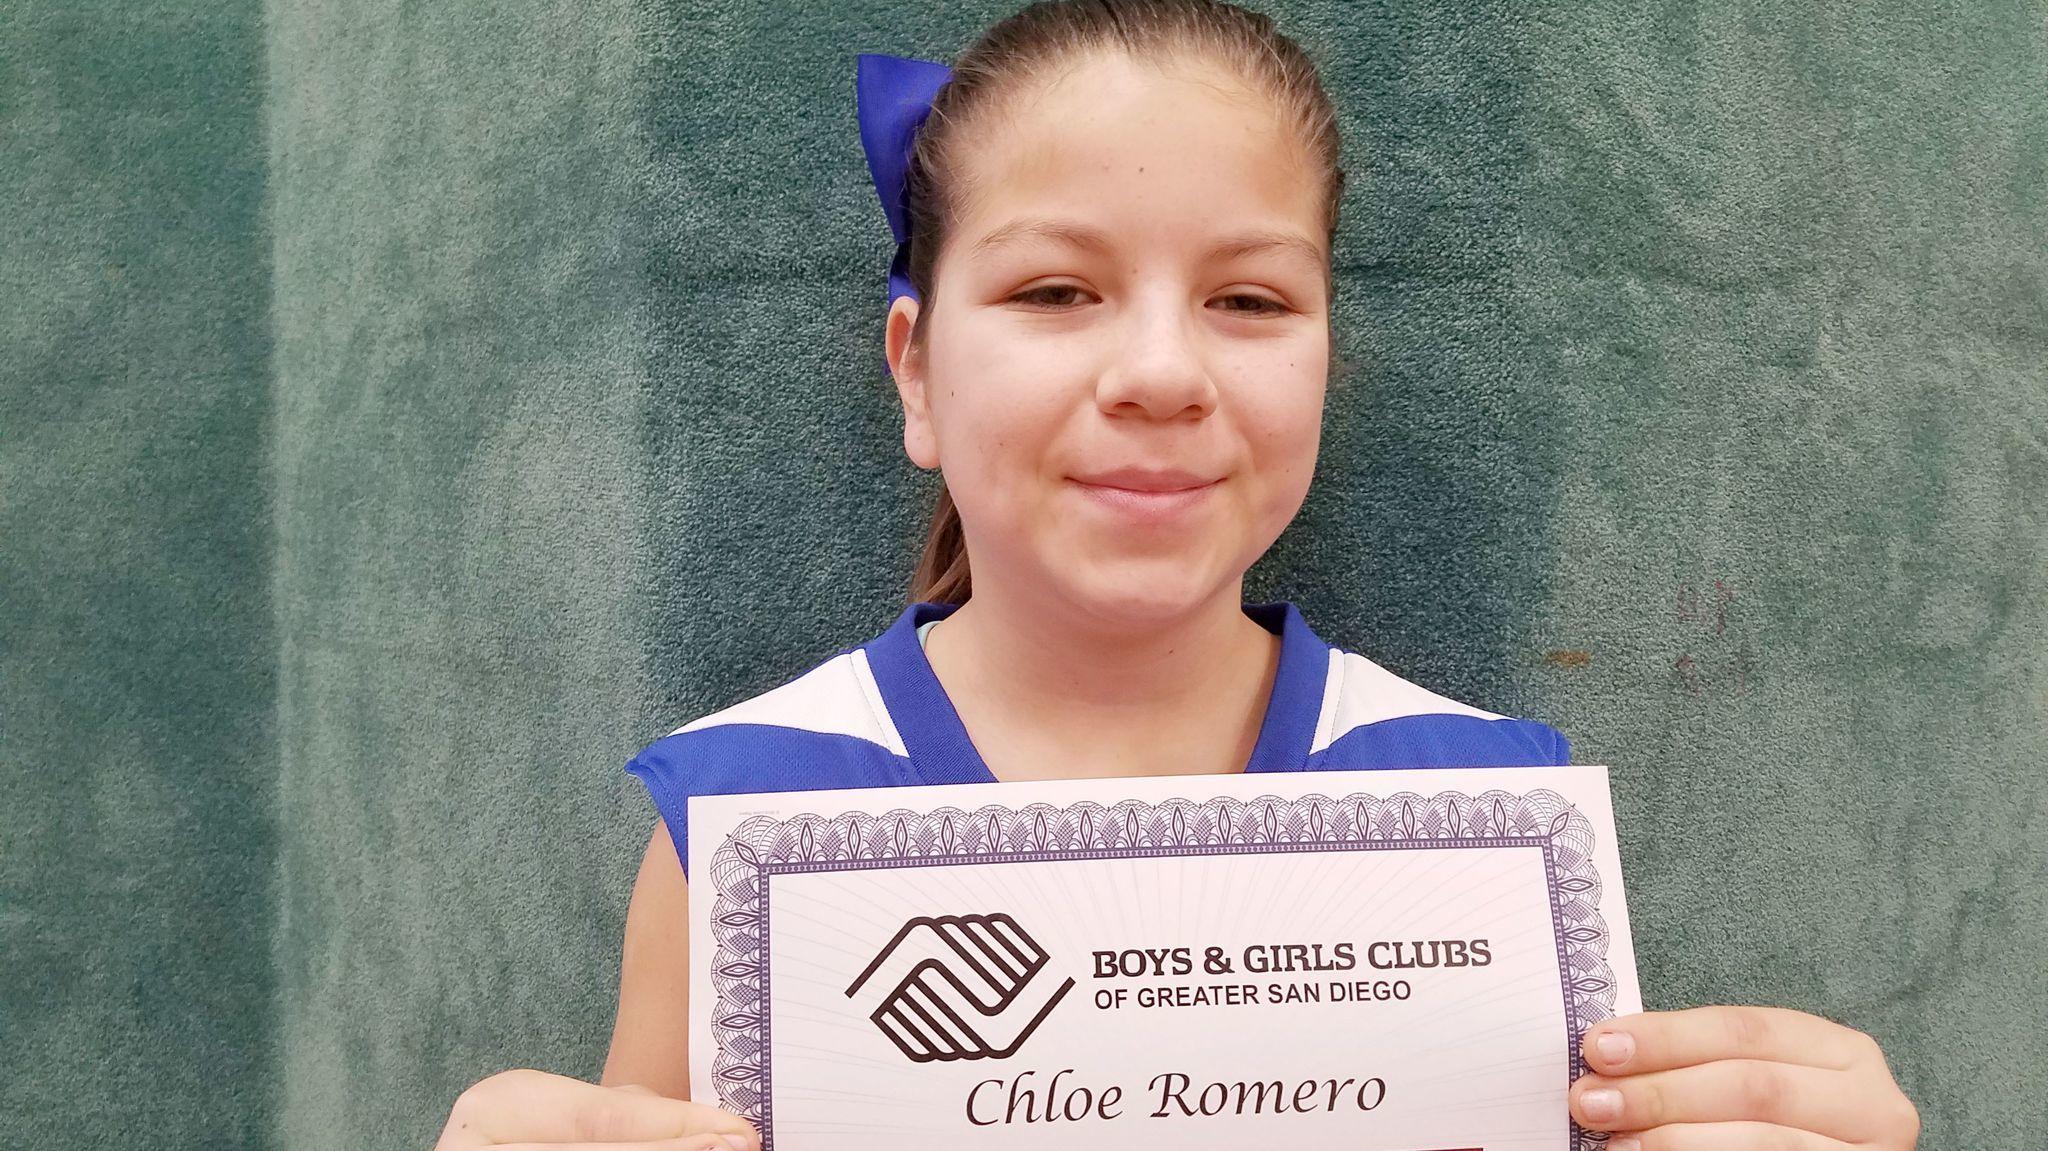 Chloe Romero